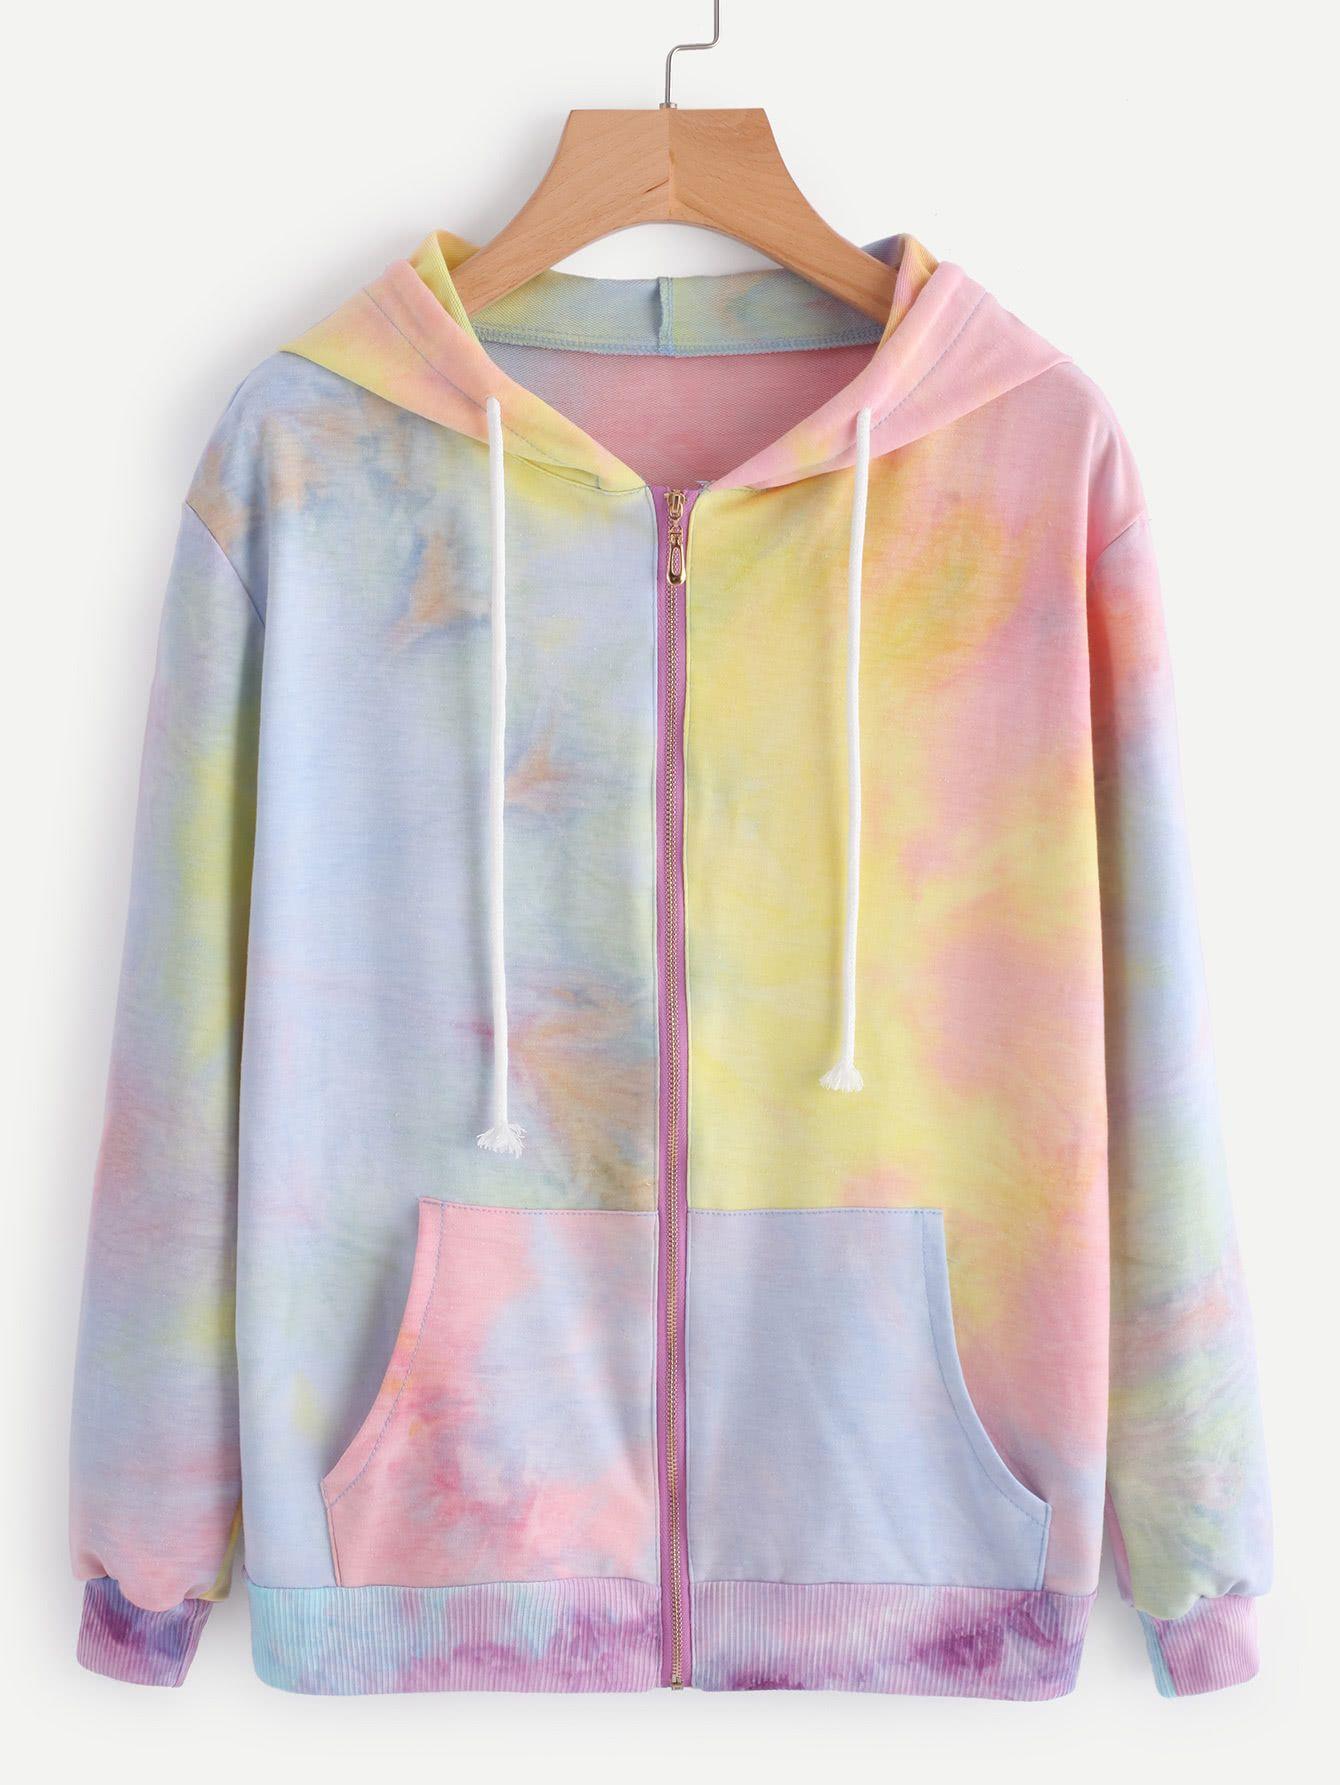 Water Color Drawstring Hooded Zip Up Jacket Tie Dye Hoodie Clothes Sweater Sale [ 1785 x 1340 Pixel ]